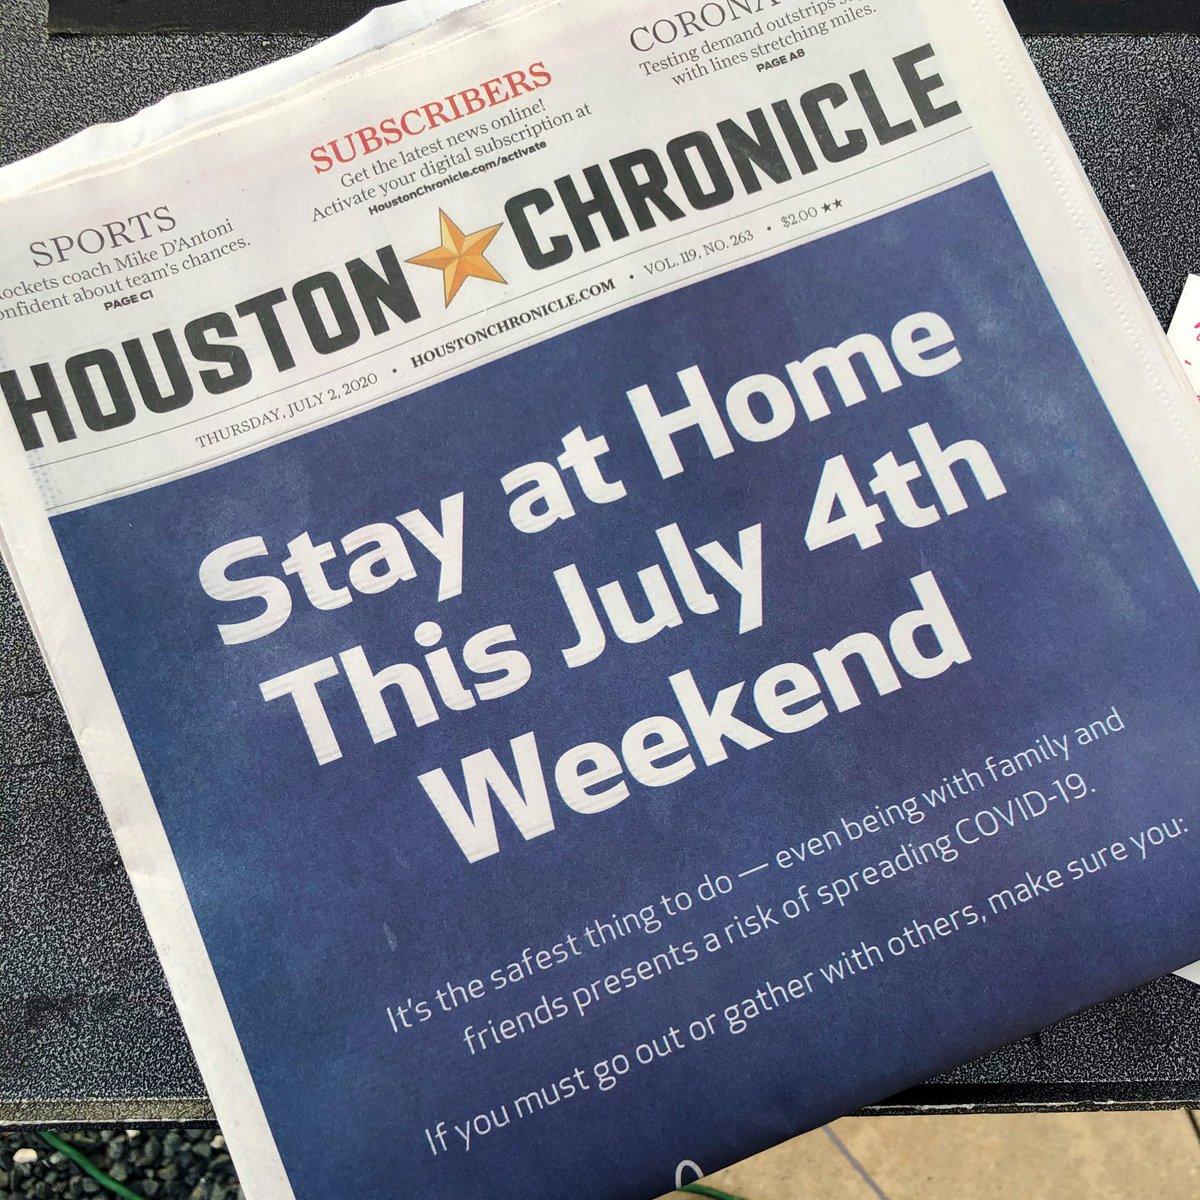 This message wraps around today's @HoustonChron (h/t @davidgura) https://t.co/yrPZRrzph2